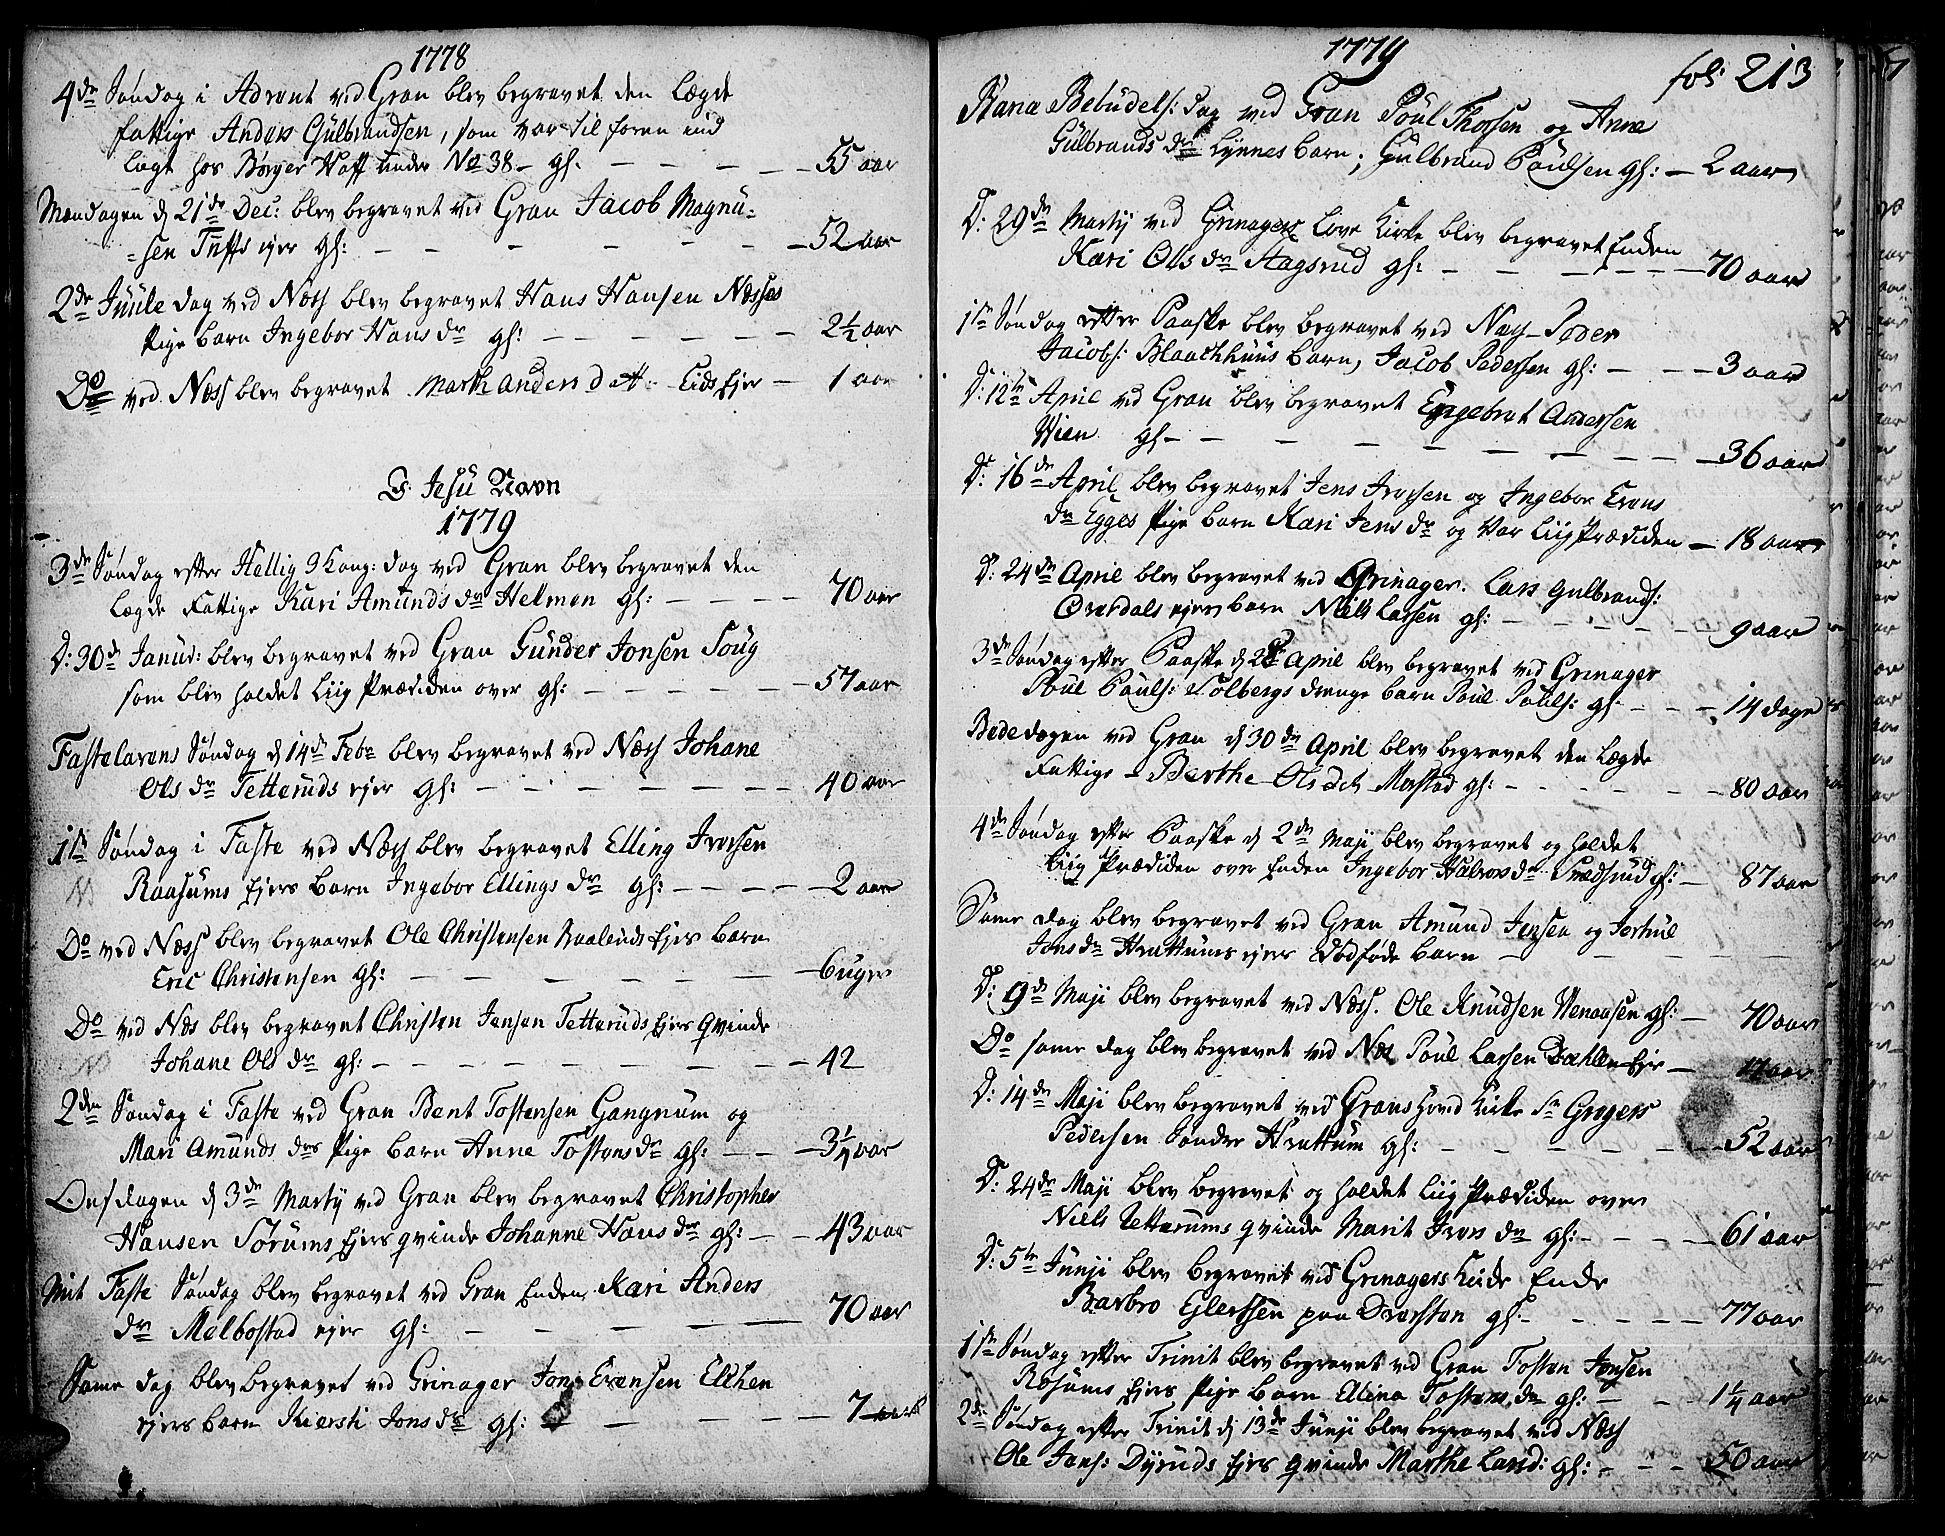 SAH, Gran prestekontor, Ministerialbok nr. 5, 1776-1788, s. 213